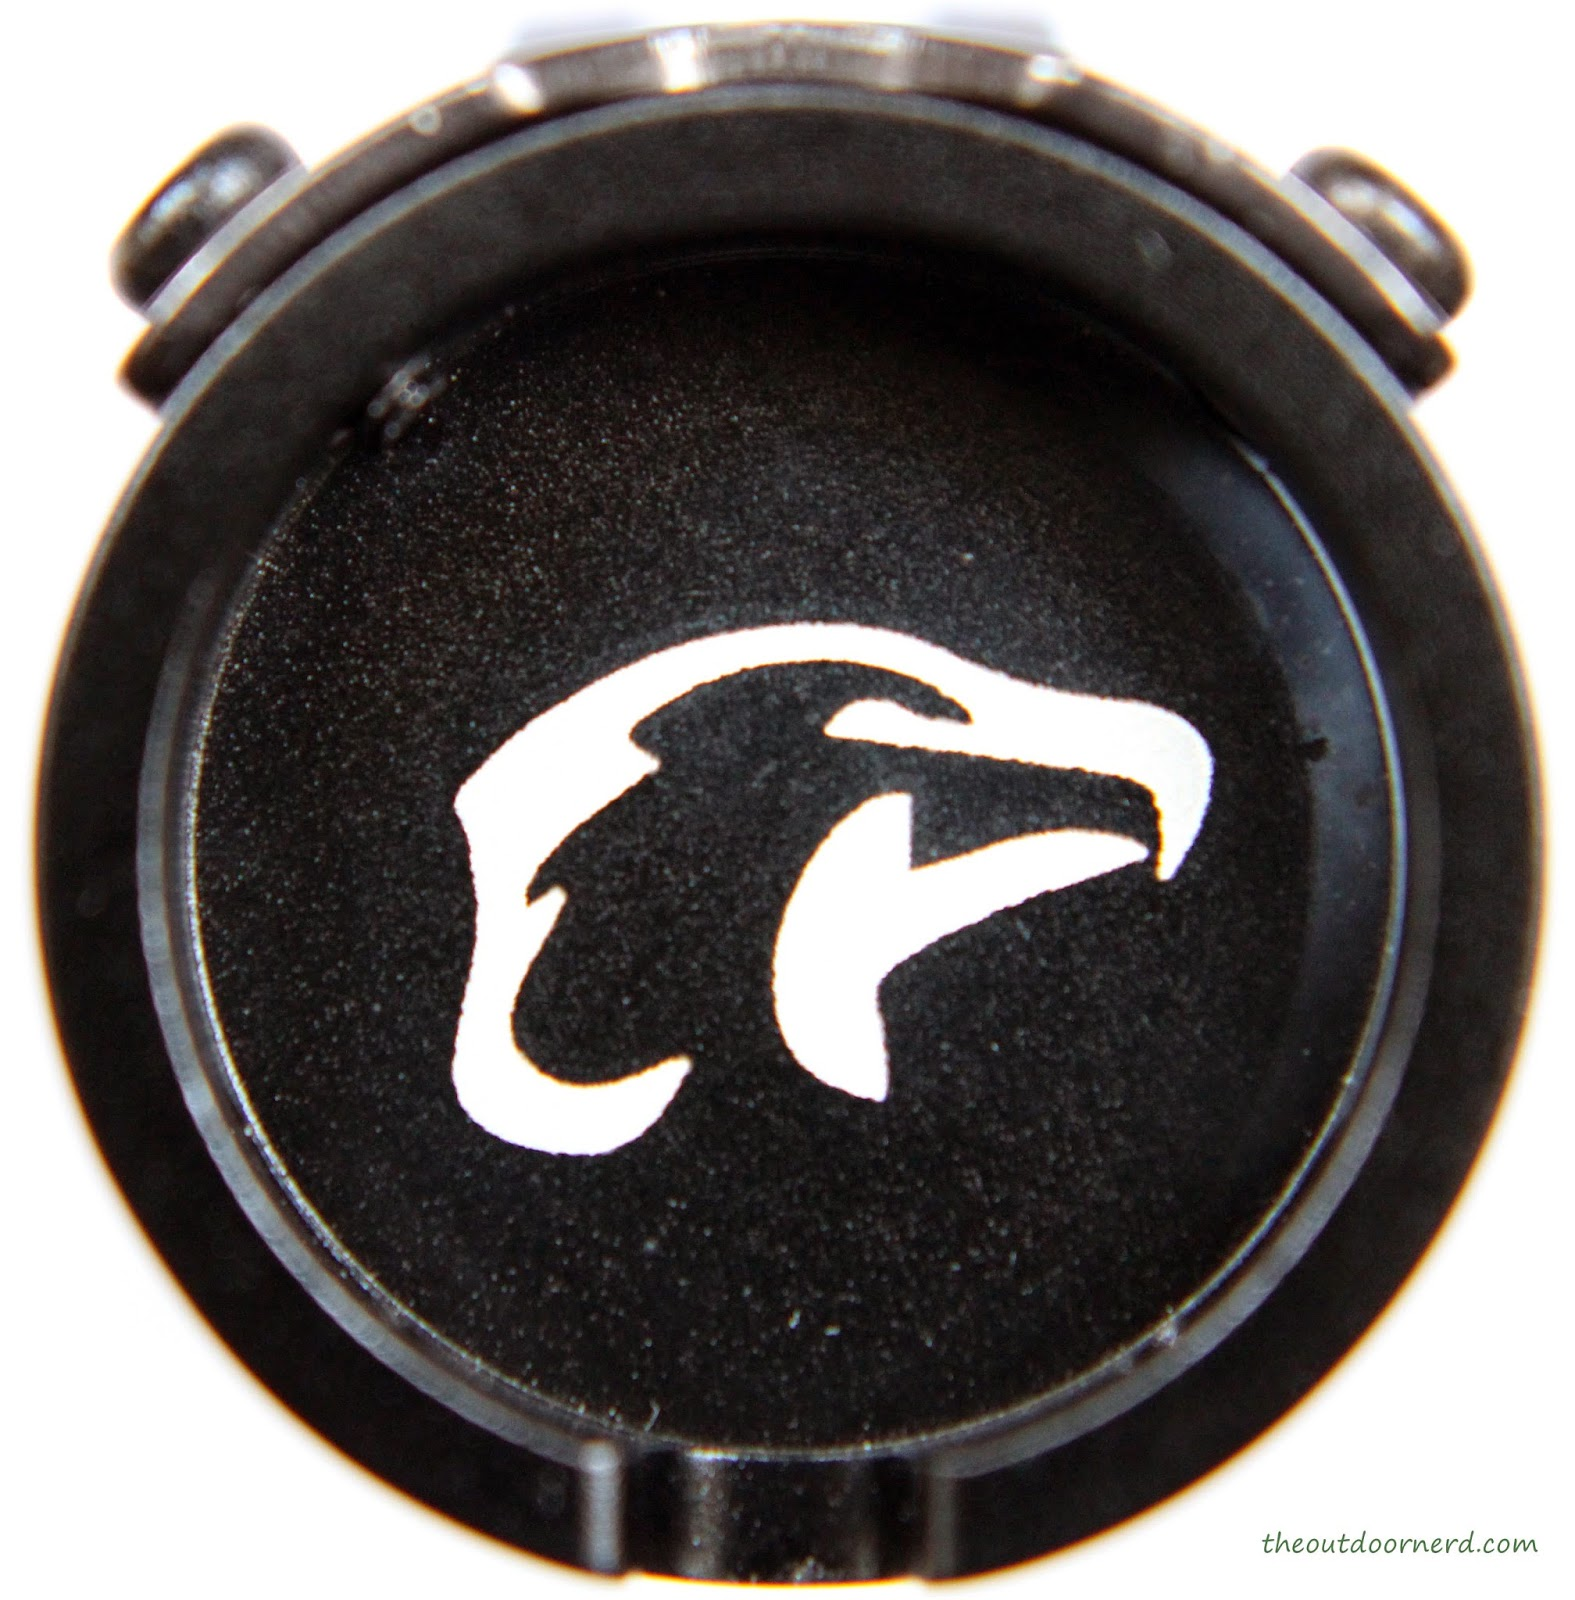 EagleTac D25LC2 Mini 18650 Flashlight Product Image 9